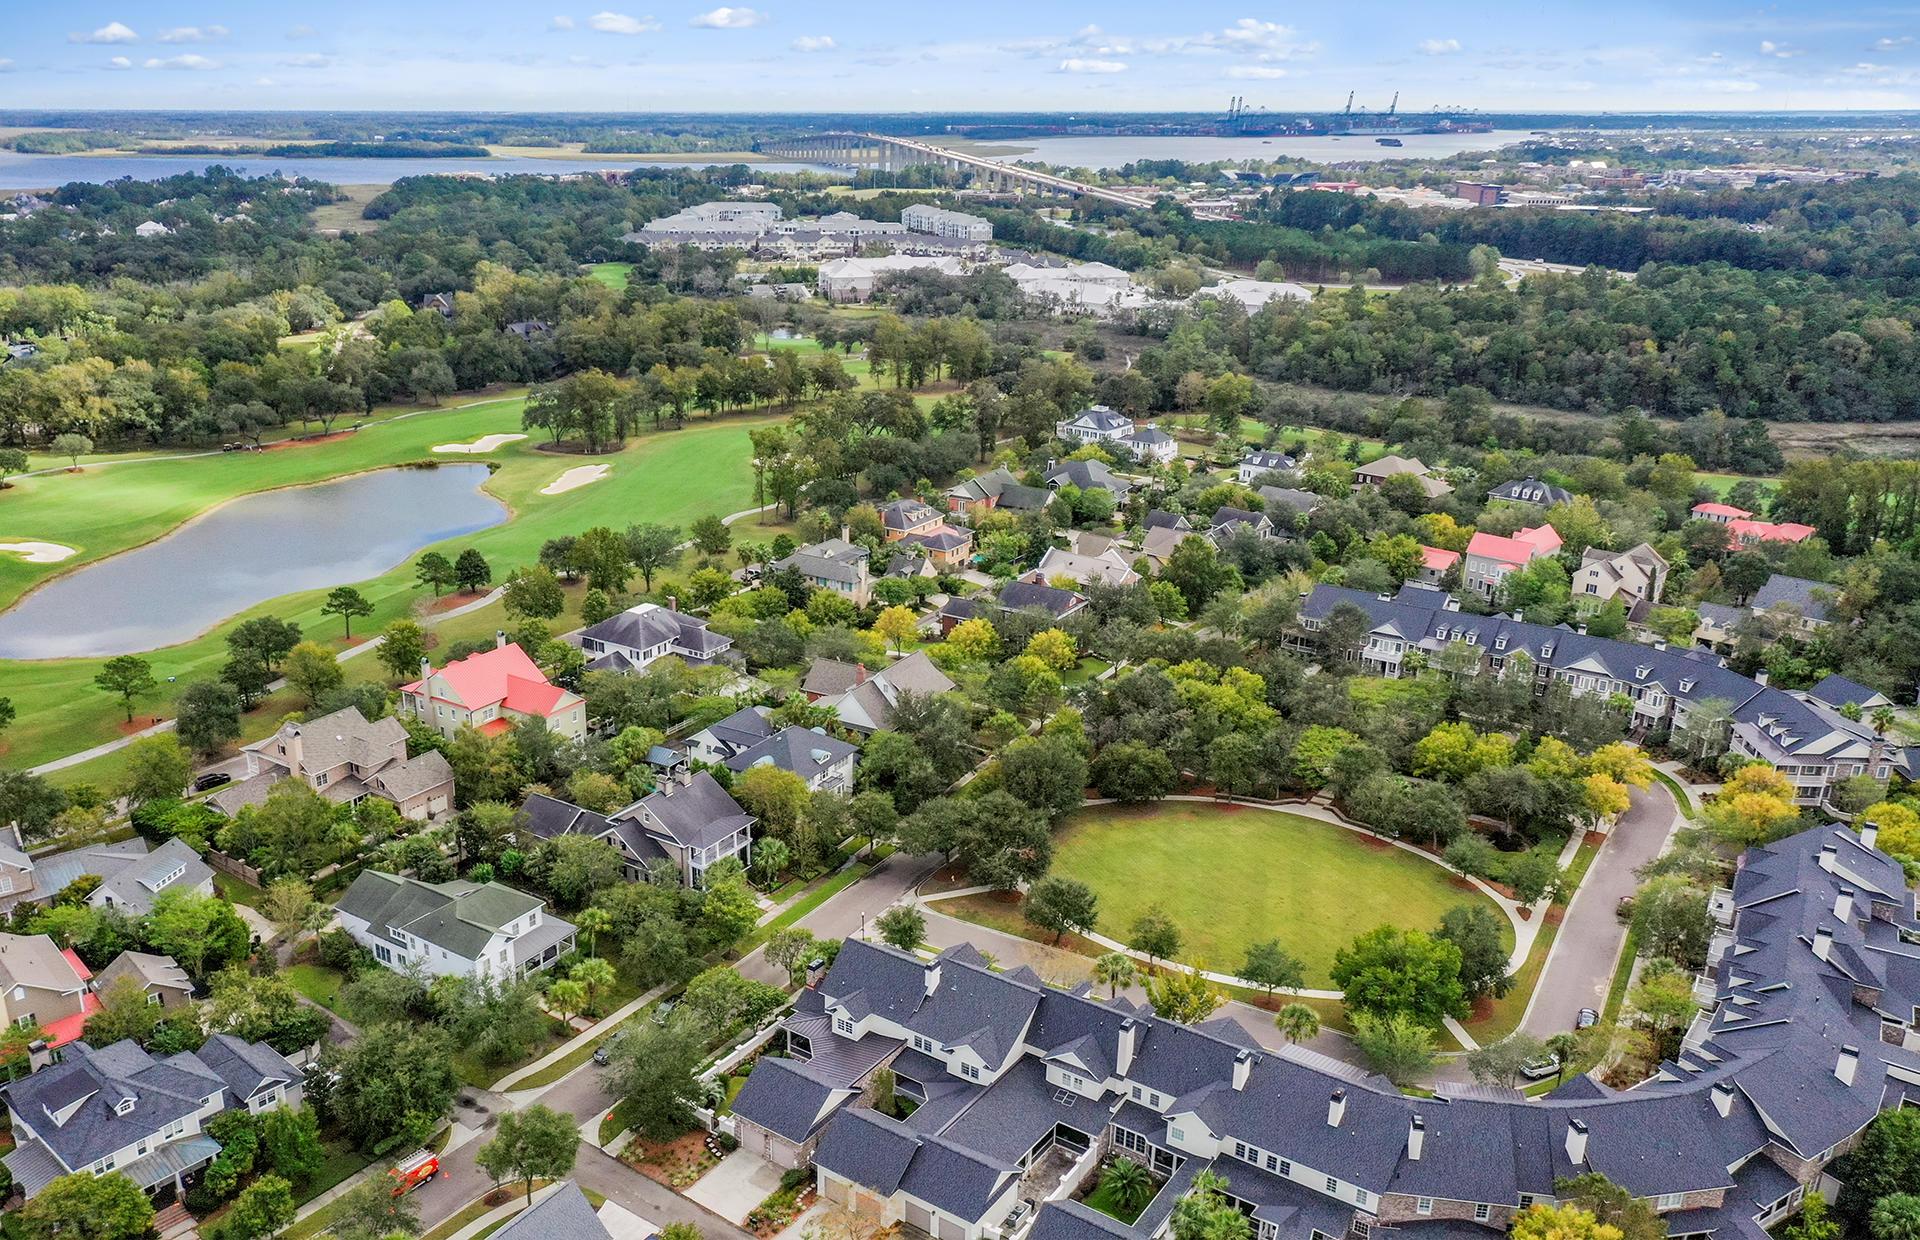 Daniel Island Park Homes For Sale - 4 Grove, Daniel Island, SC - 0